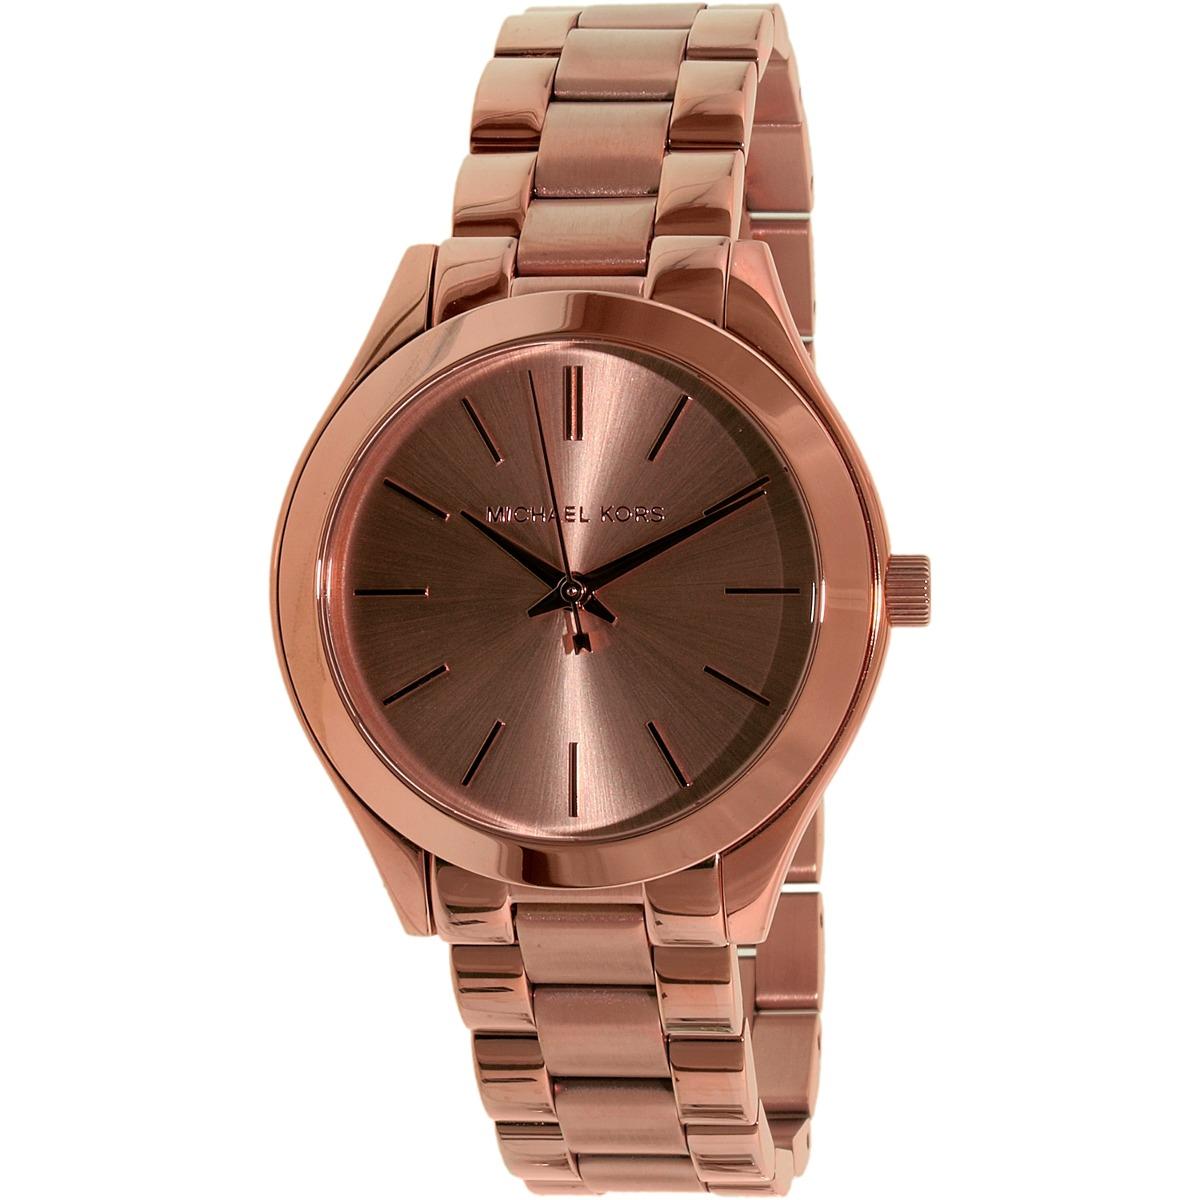 879c10151318 reloj michael kors para mujer mk3513 tono oro rosa de acero. Cargando zoom.